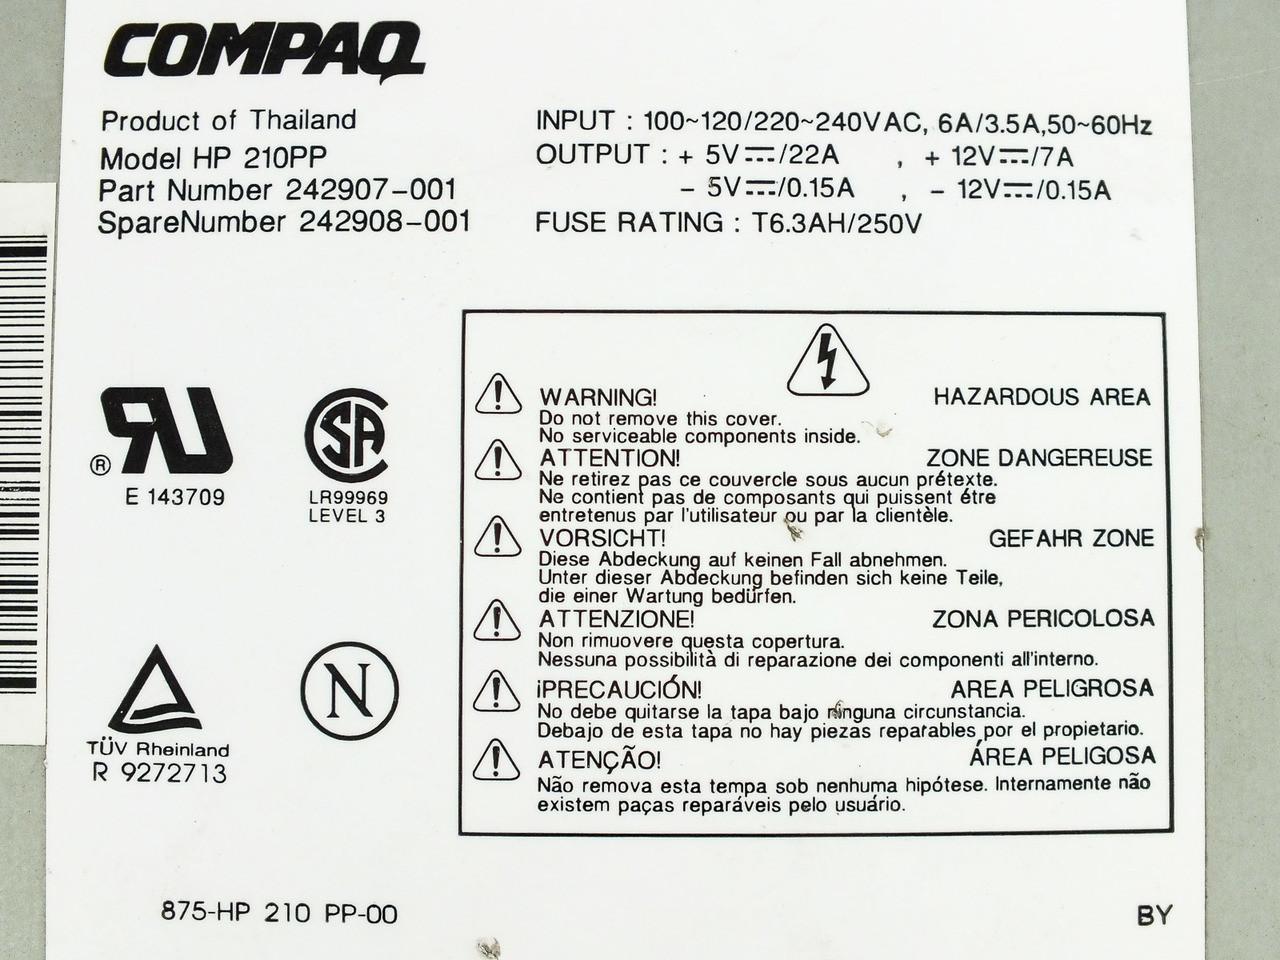 Compaq 242908-001 200W AT Power Supply Deskpro 2000 242907-001 210PP HP210PP